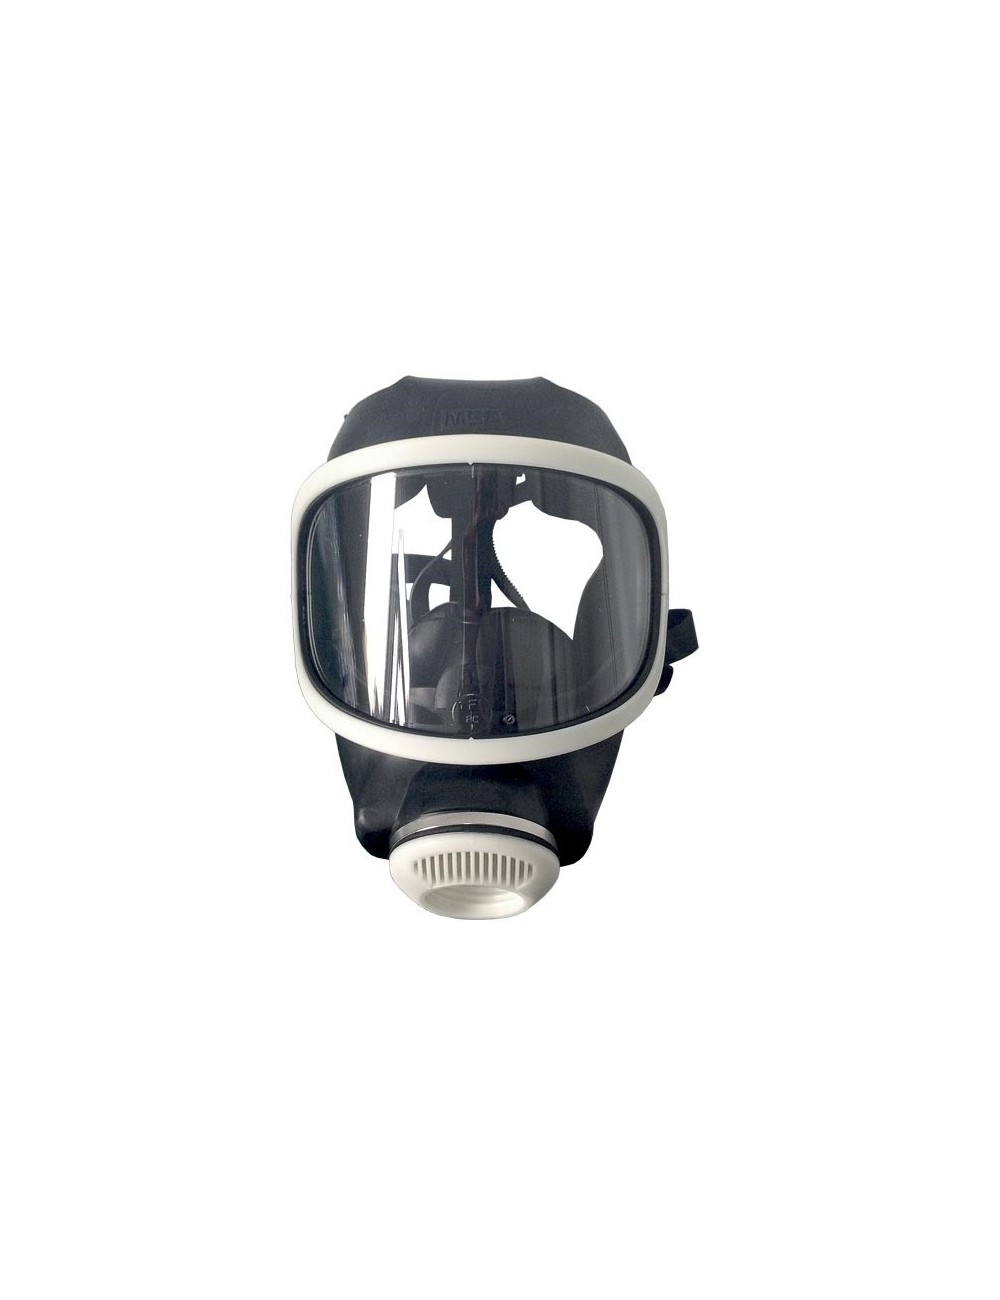 Maska całotwarzowa MSA 3S Basic Plus